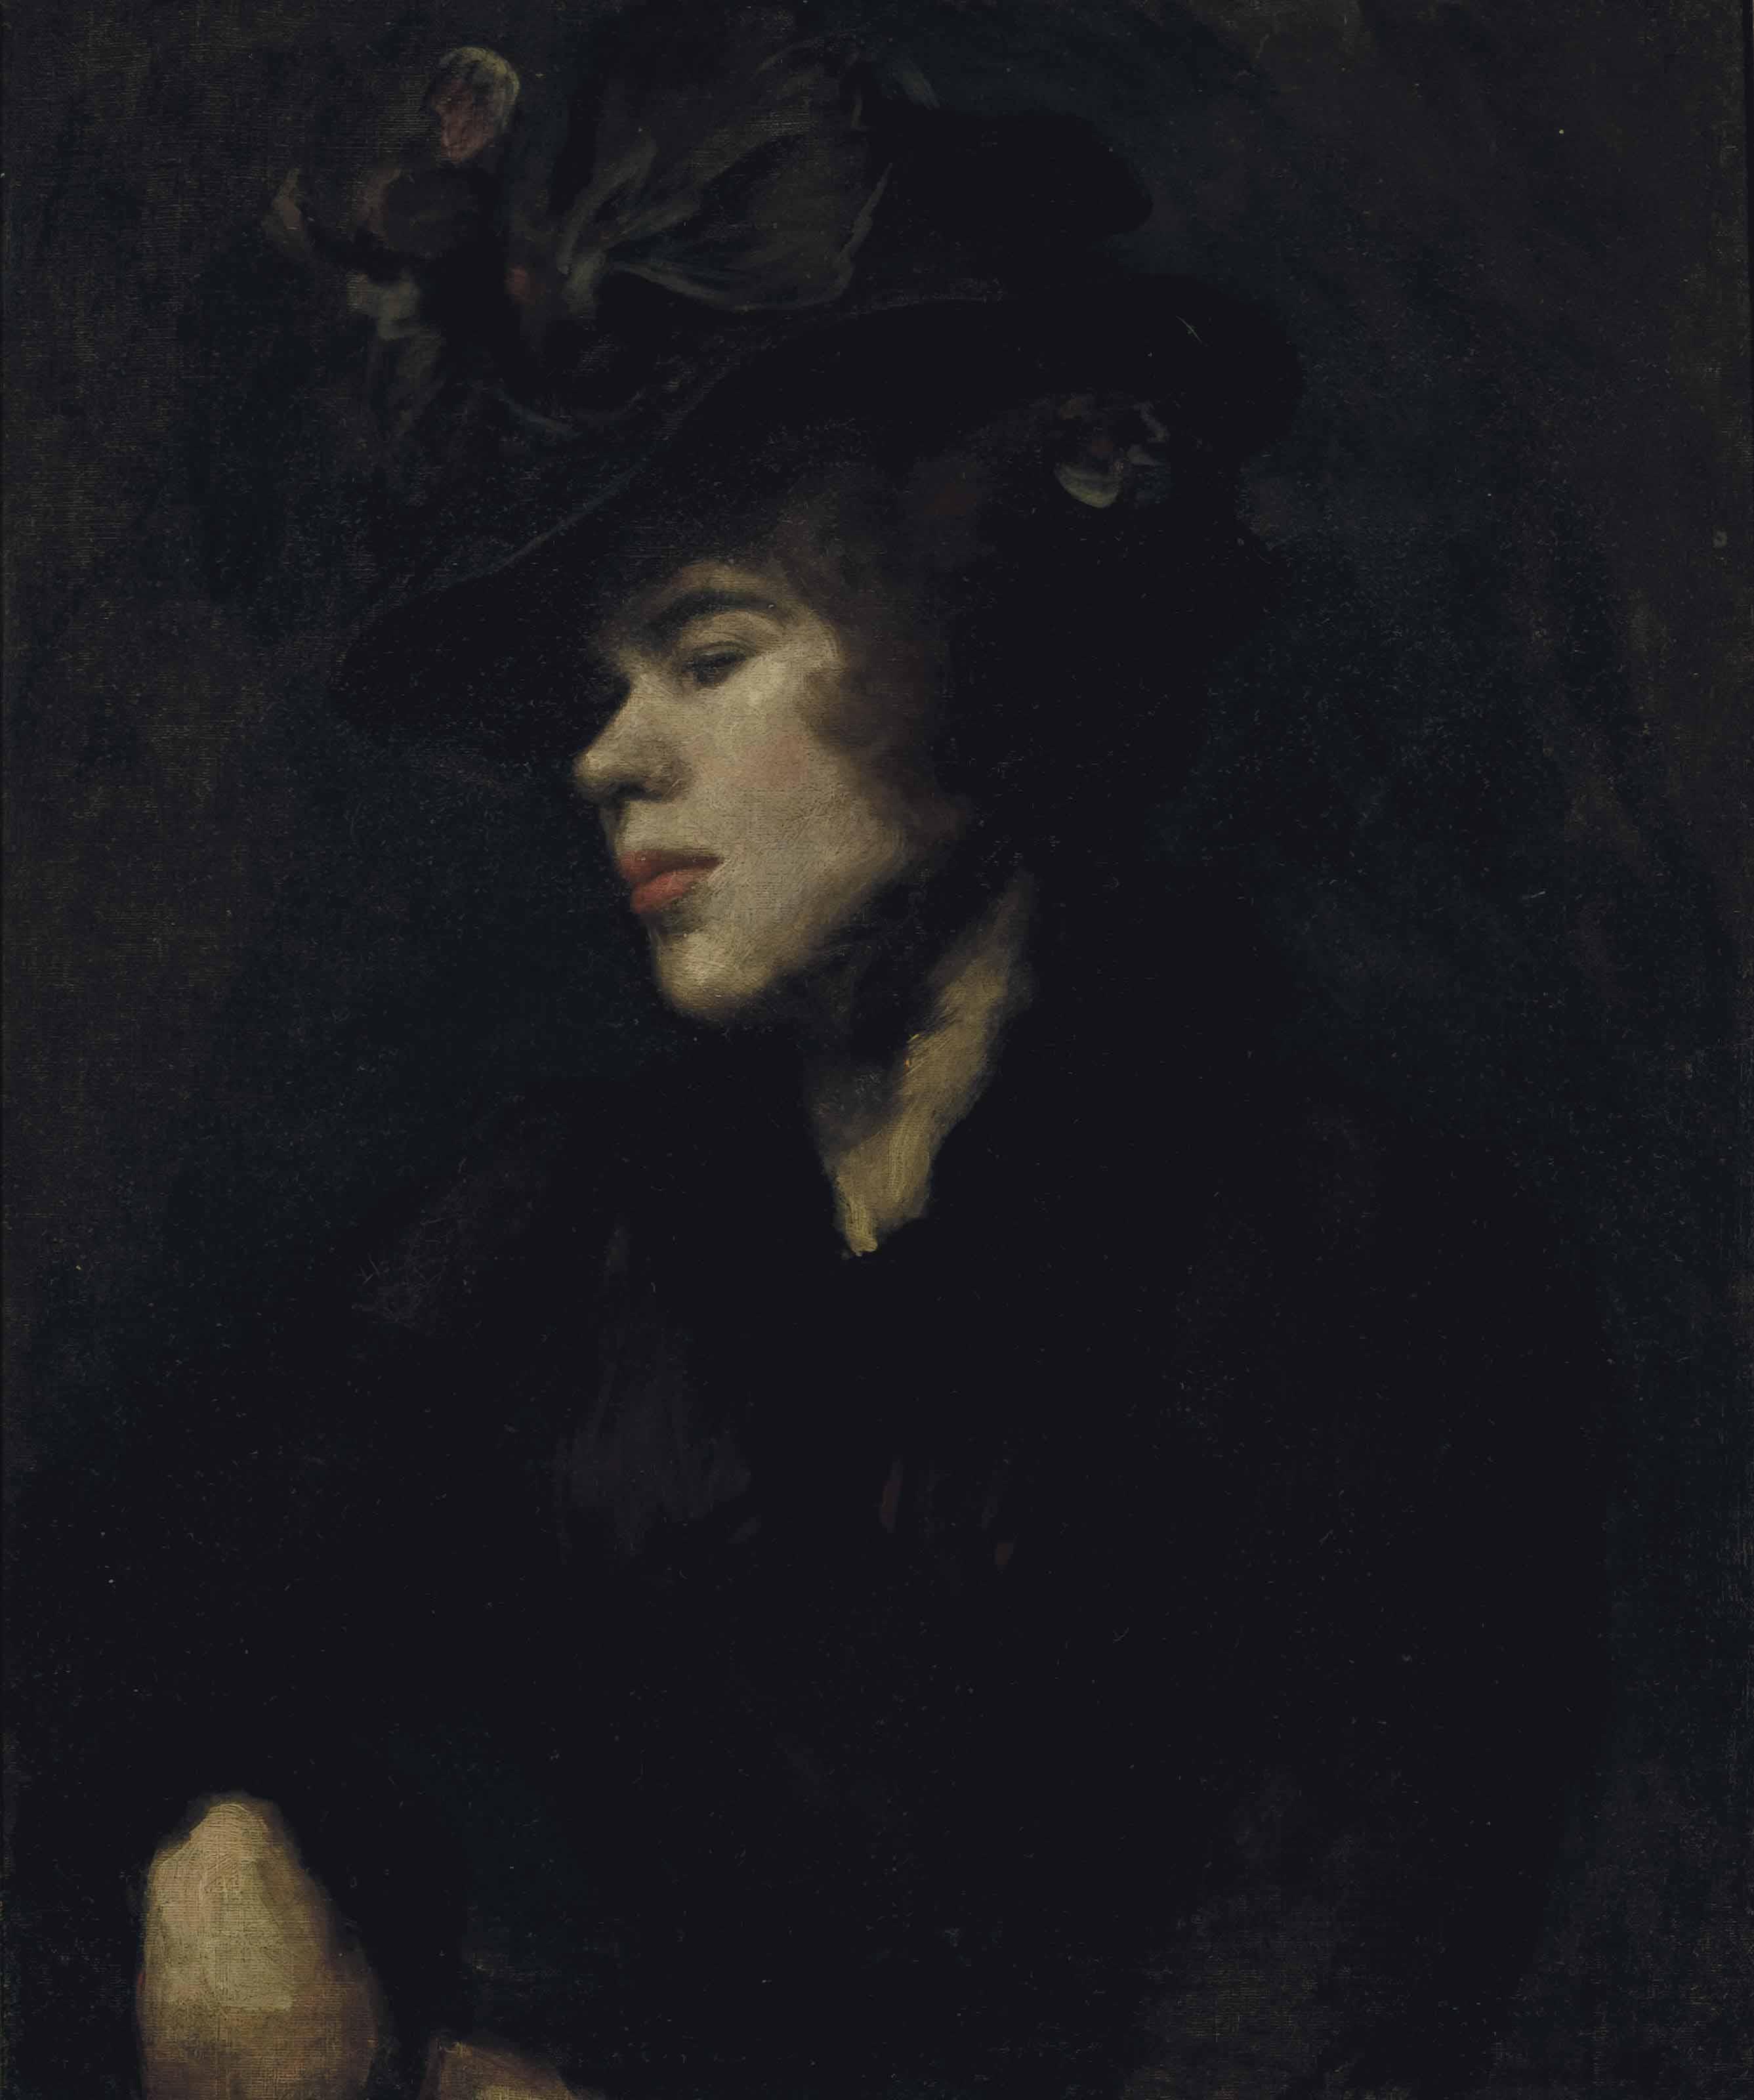 Portrait of Ida Nettleship (1877-1907), half-length, in a burgundy dress and hat